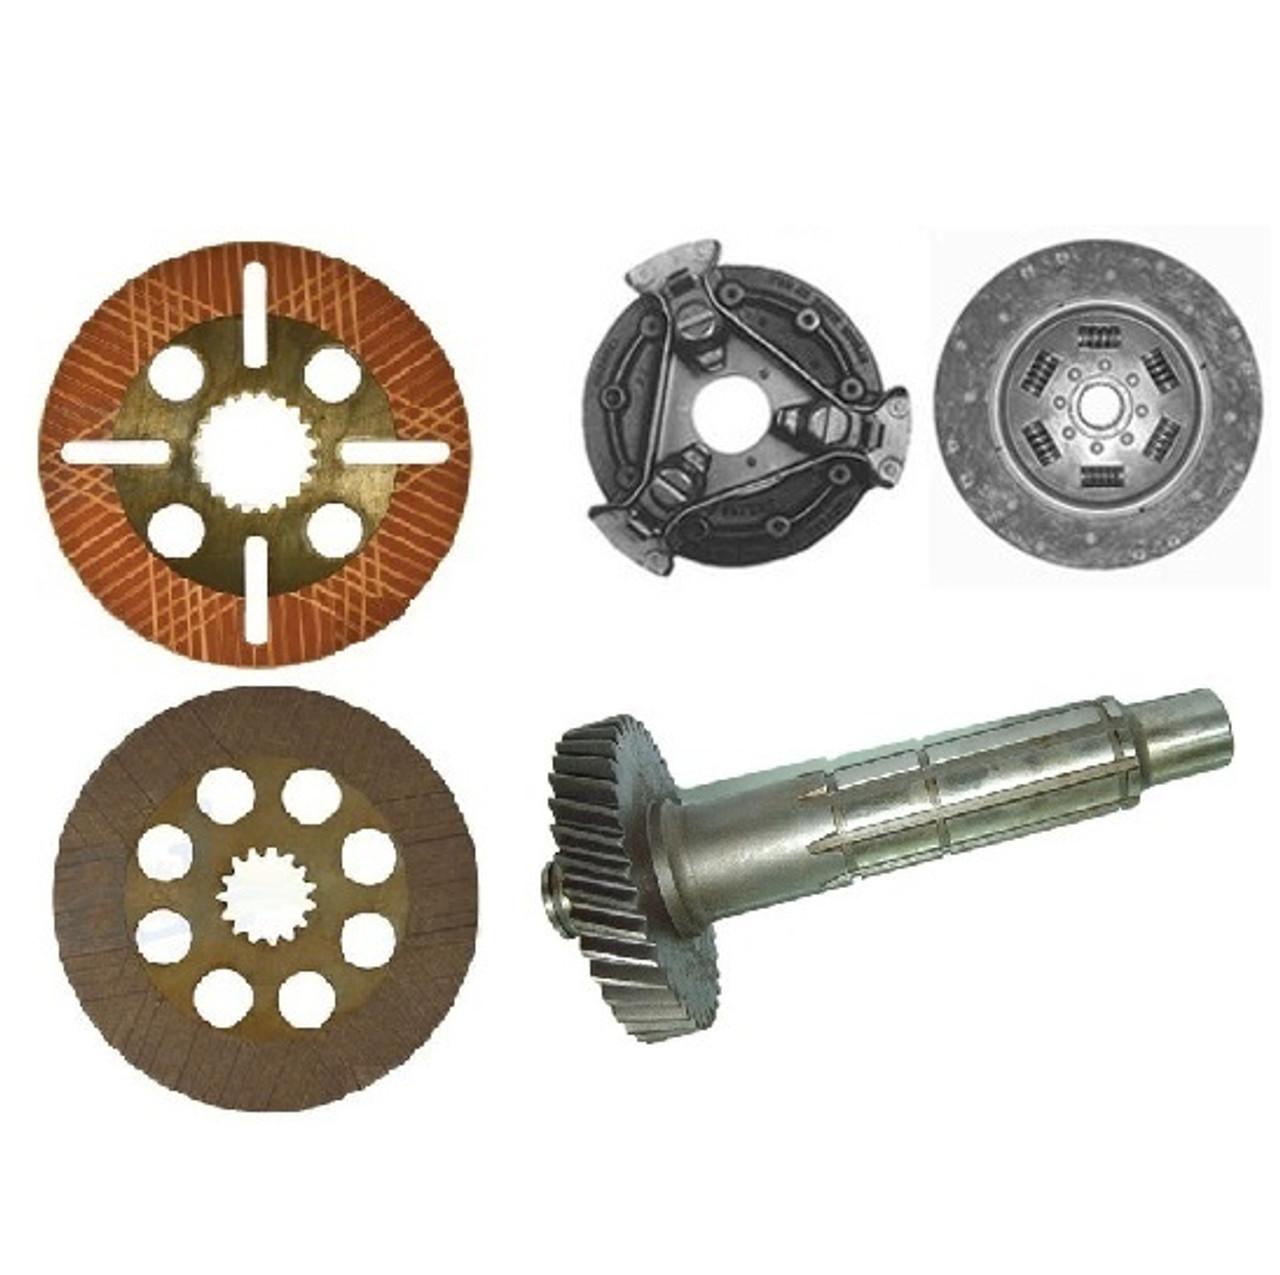 John Deere Backhoe Parts | John Deere Backhoe Used Parts